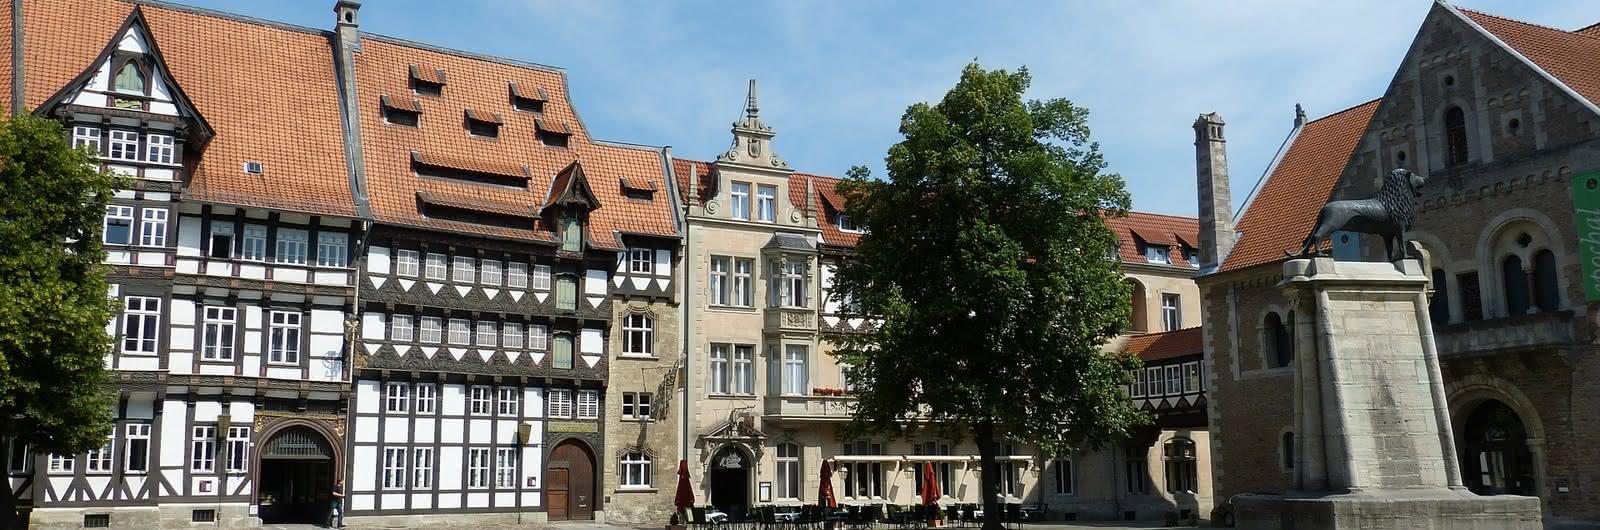 braunschweig city header